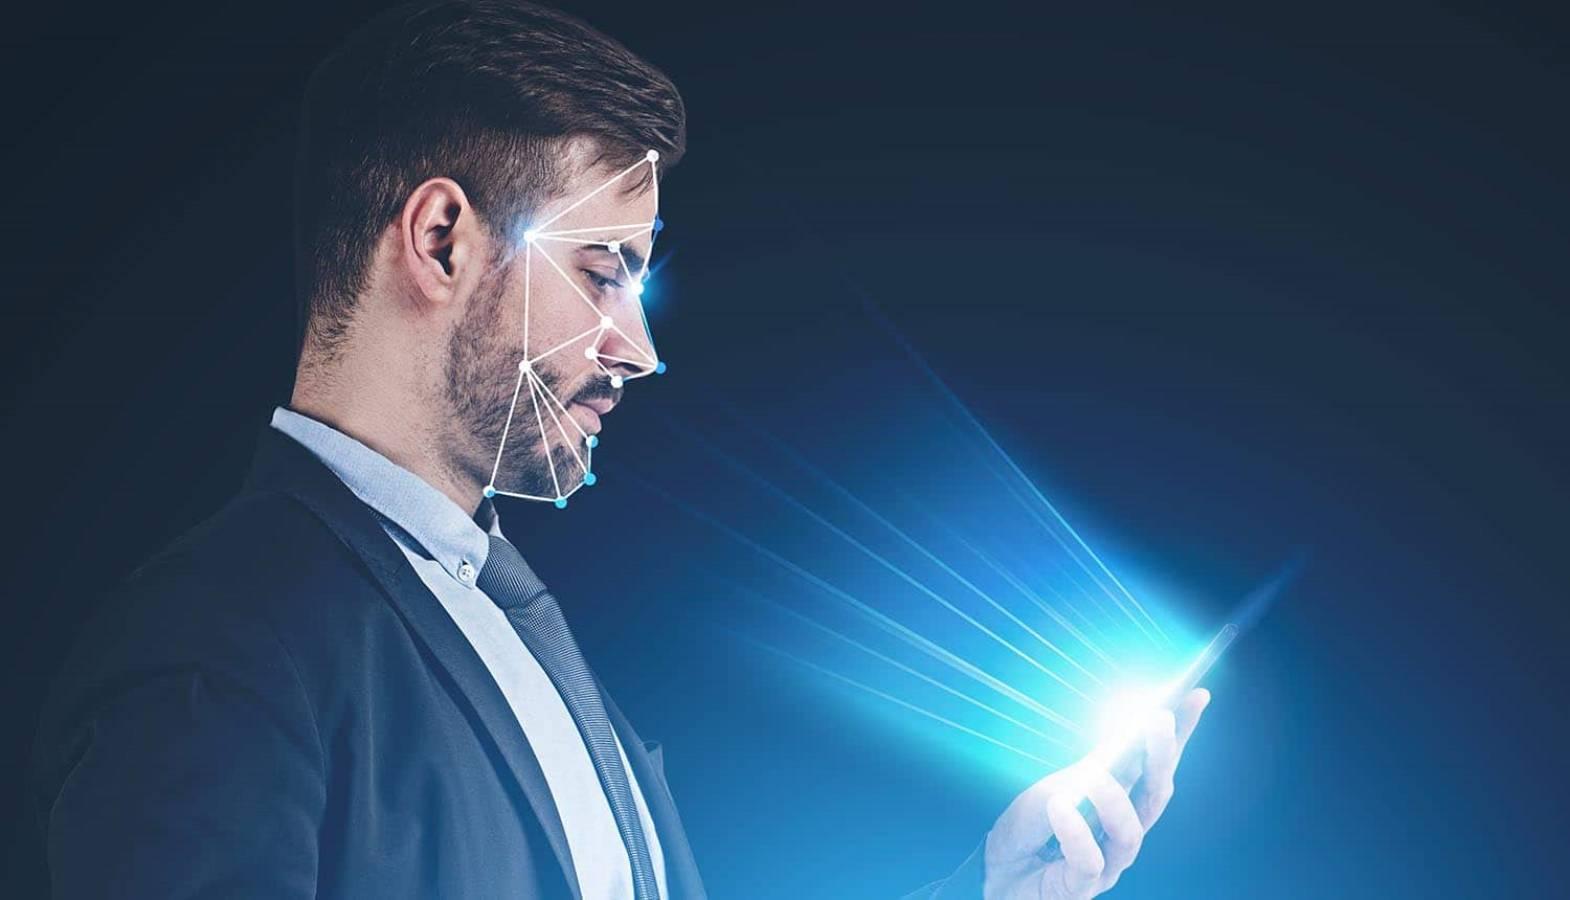 Scanarea Faciala OBLIGATORIE la Abonamentele de Telefonie in Aceasta Tara